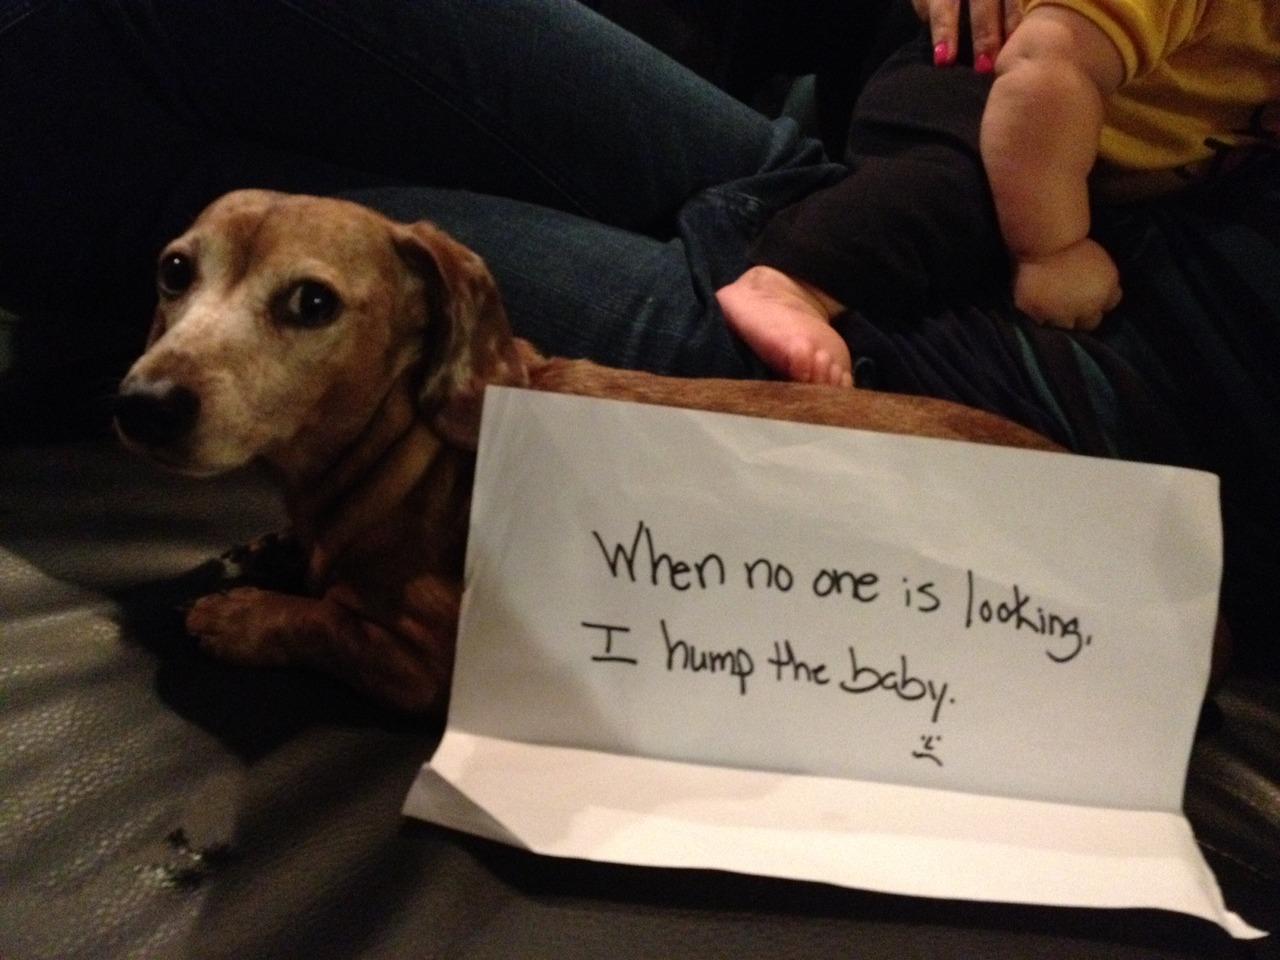 Mindless Drivel Makes Me Giggle: Dog shaming...